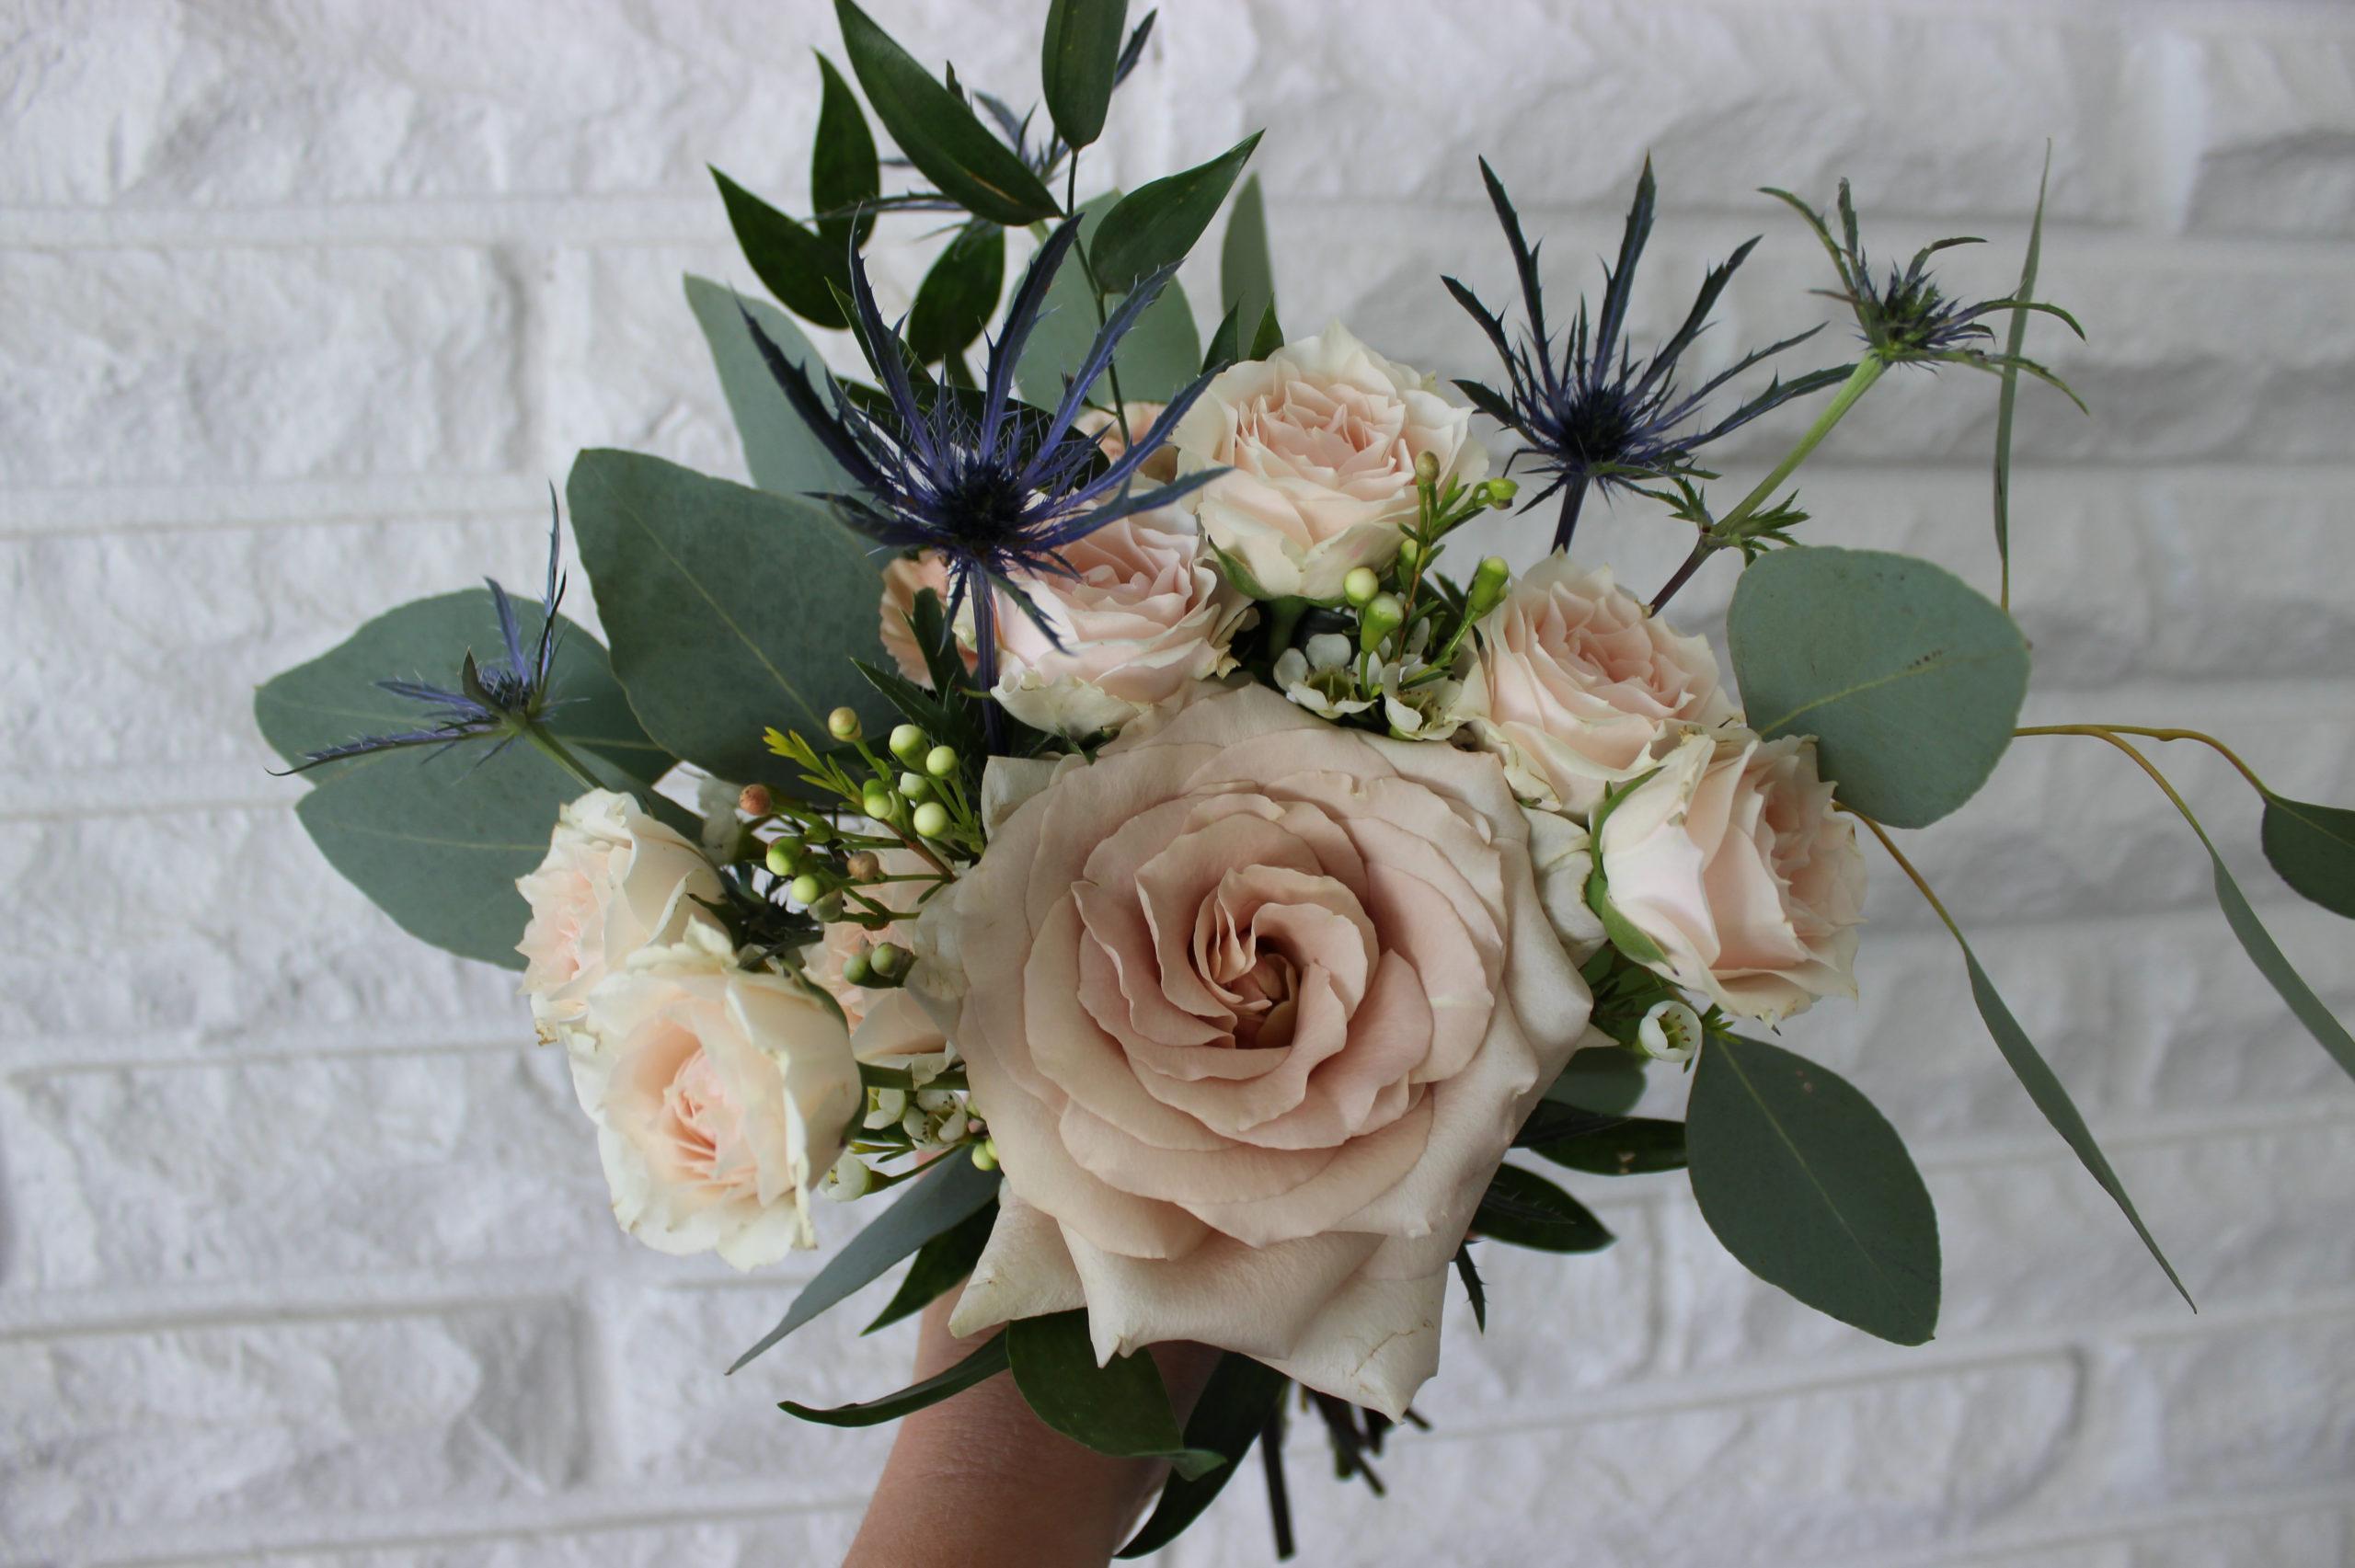 blush and blue bridesmaid bouquet by evansville florist emerald design